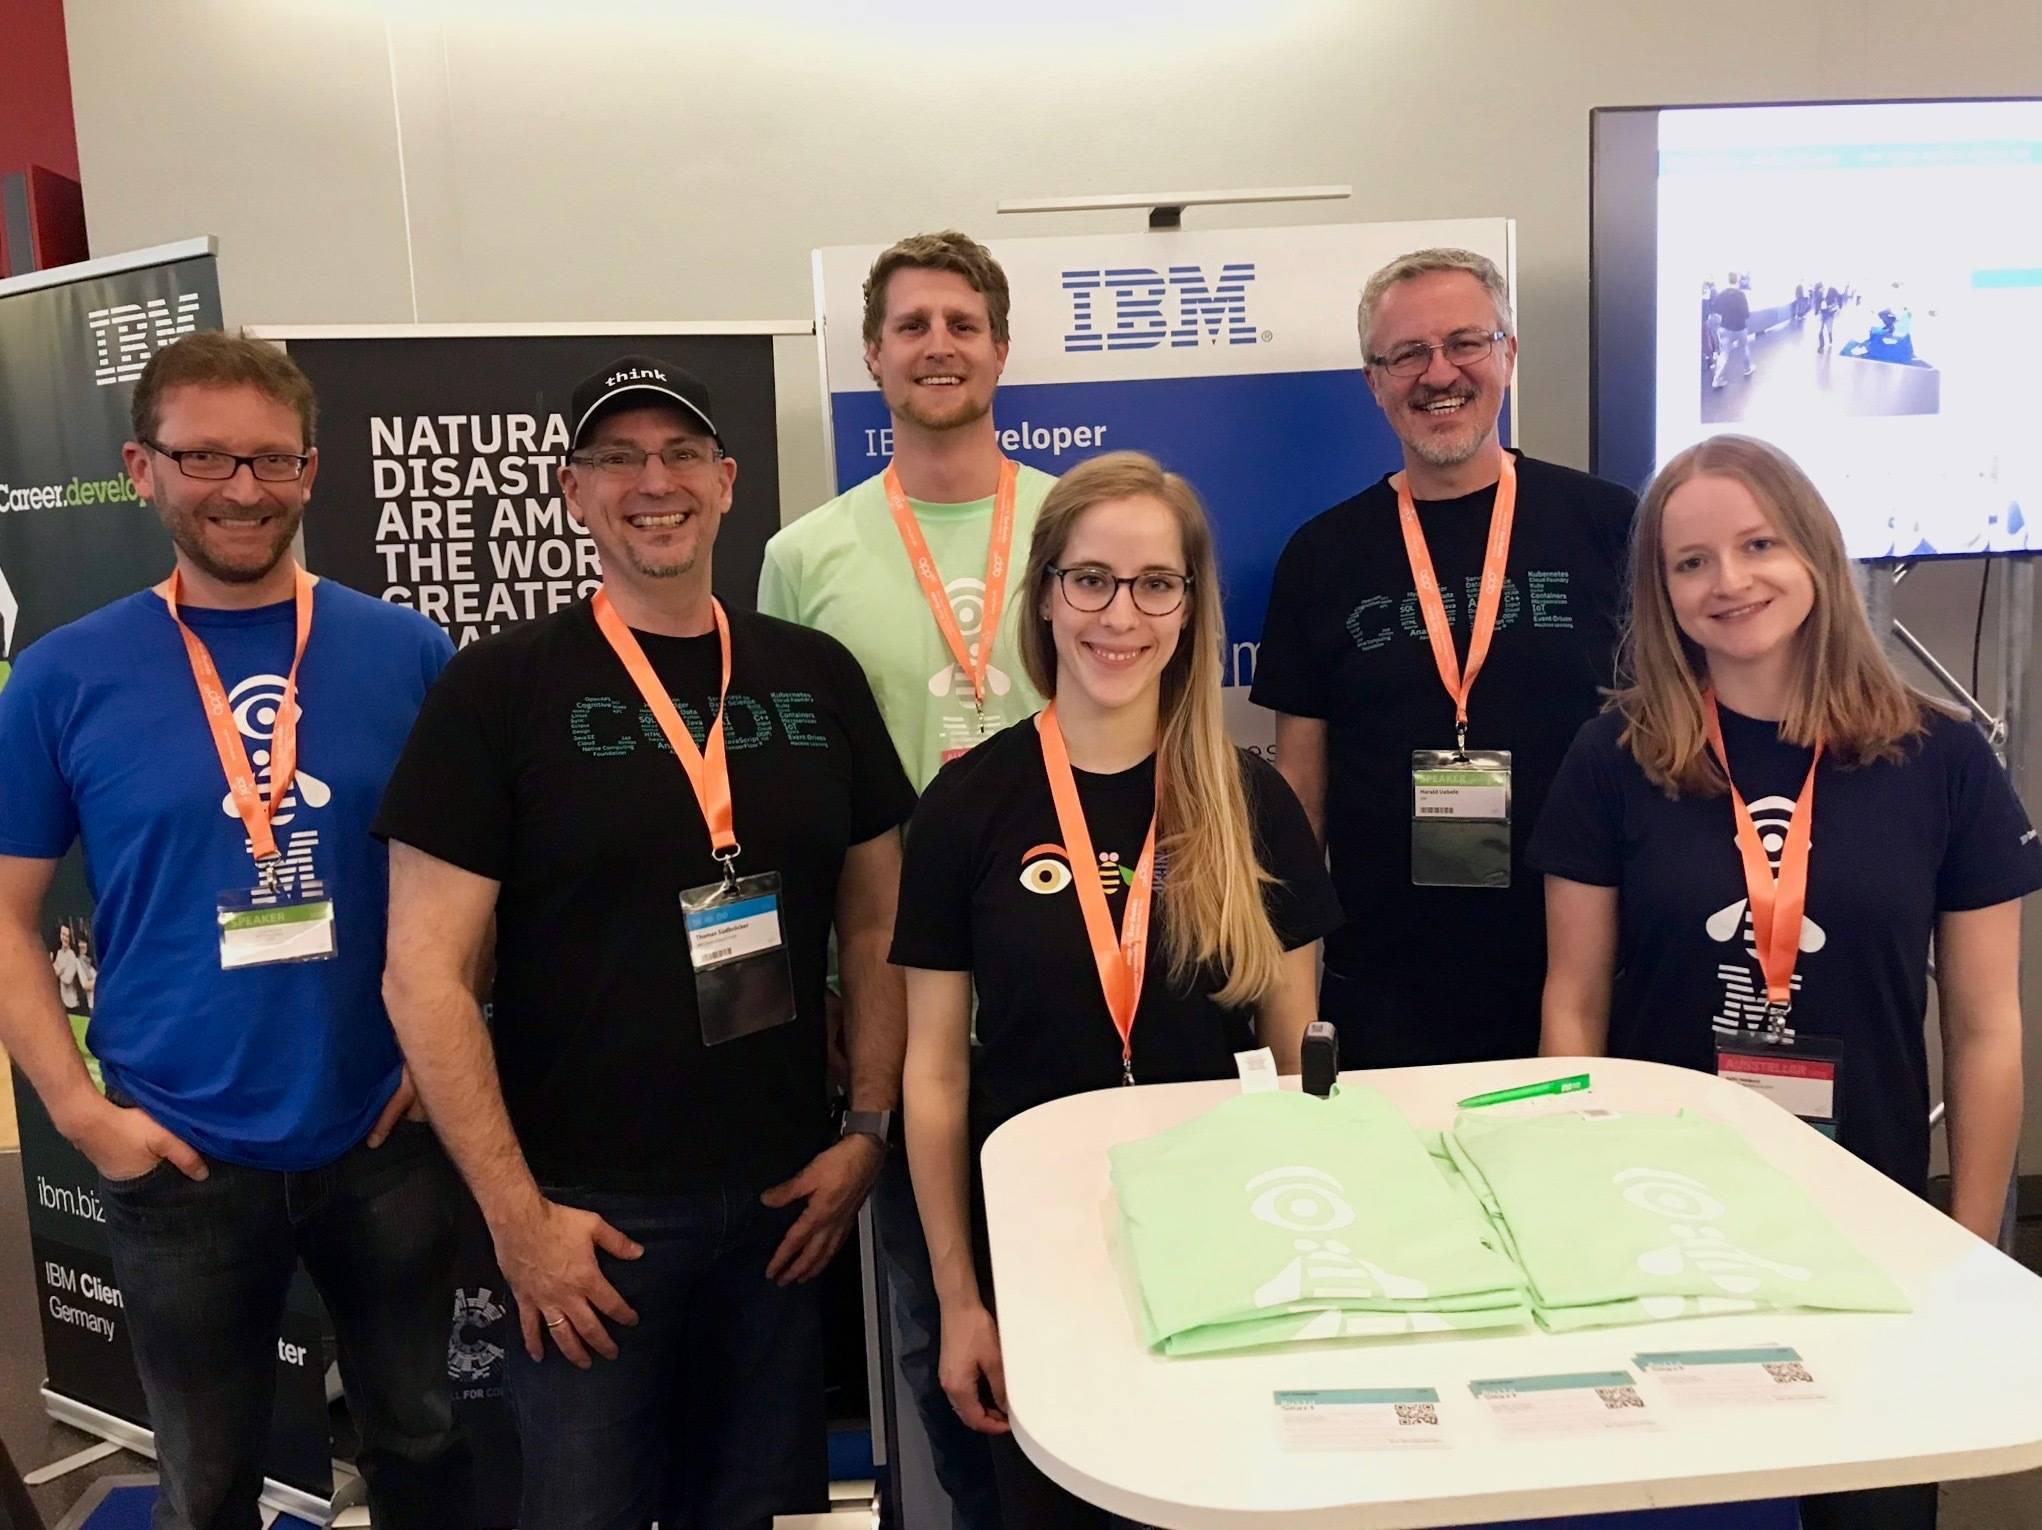 The IBM team at JAX 2019